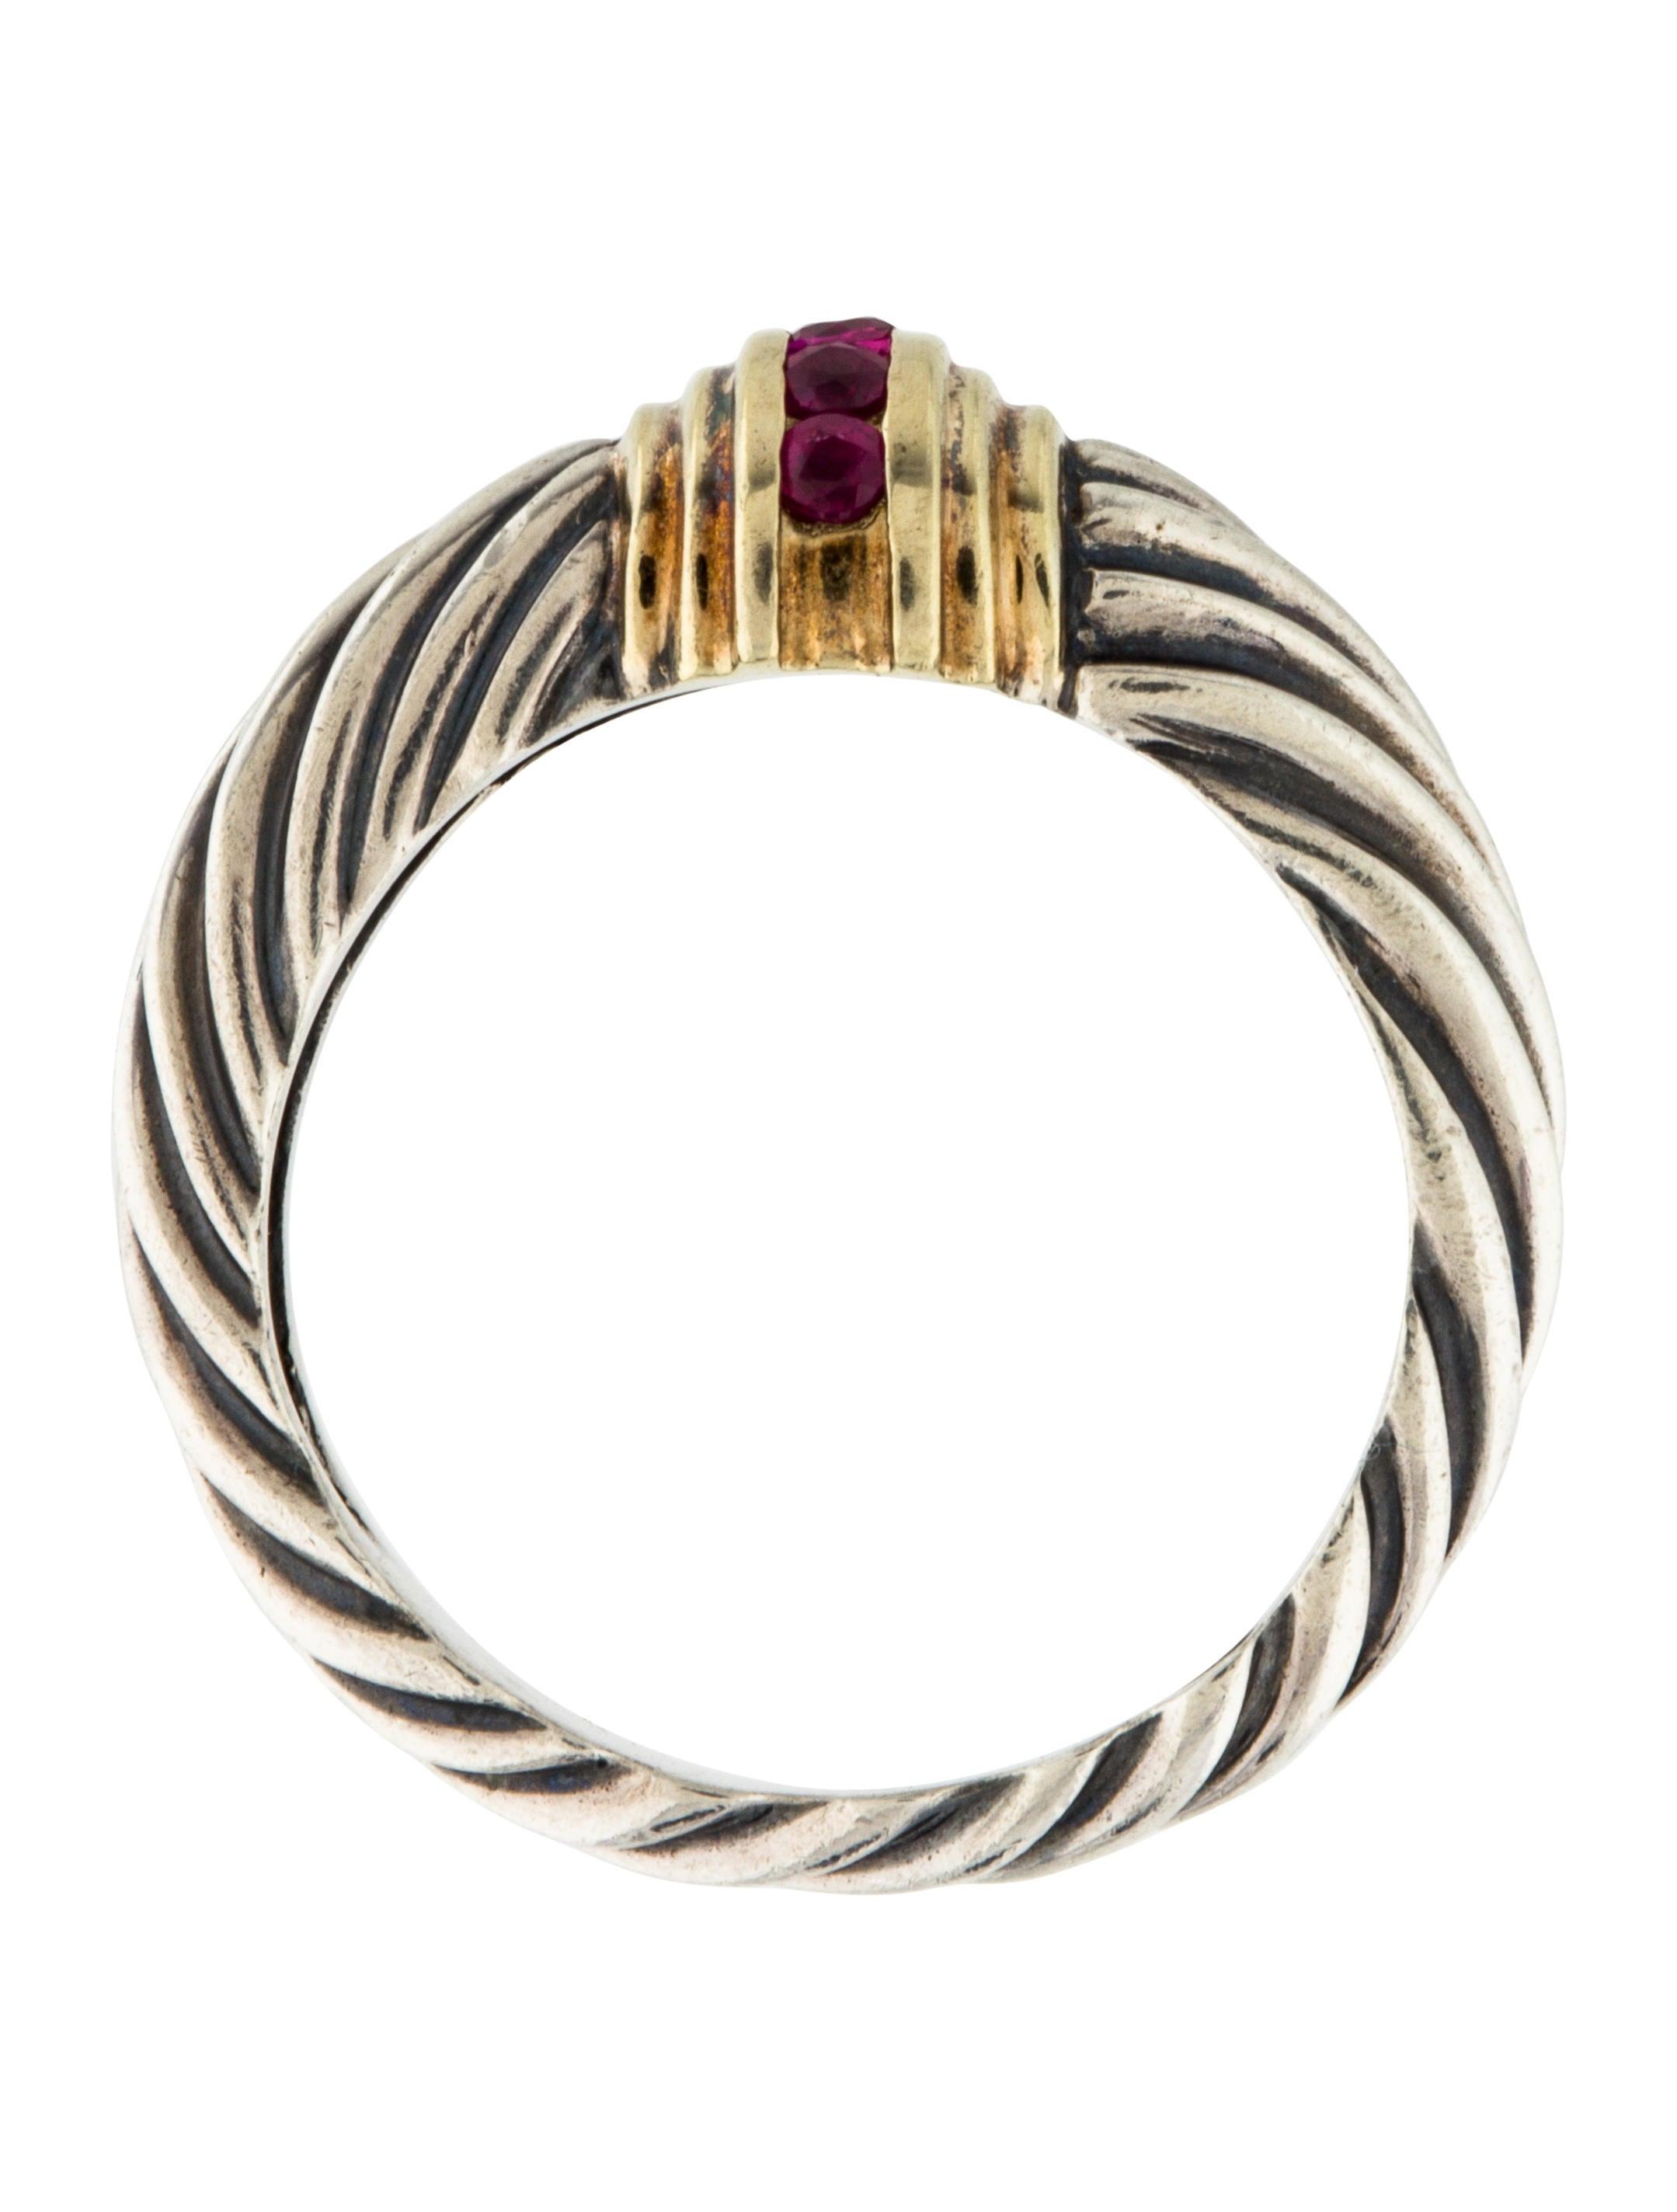 David yurman ruby cable ring rings dvy43055 the realreal for David yurman inspired jewelry rings